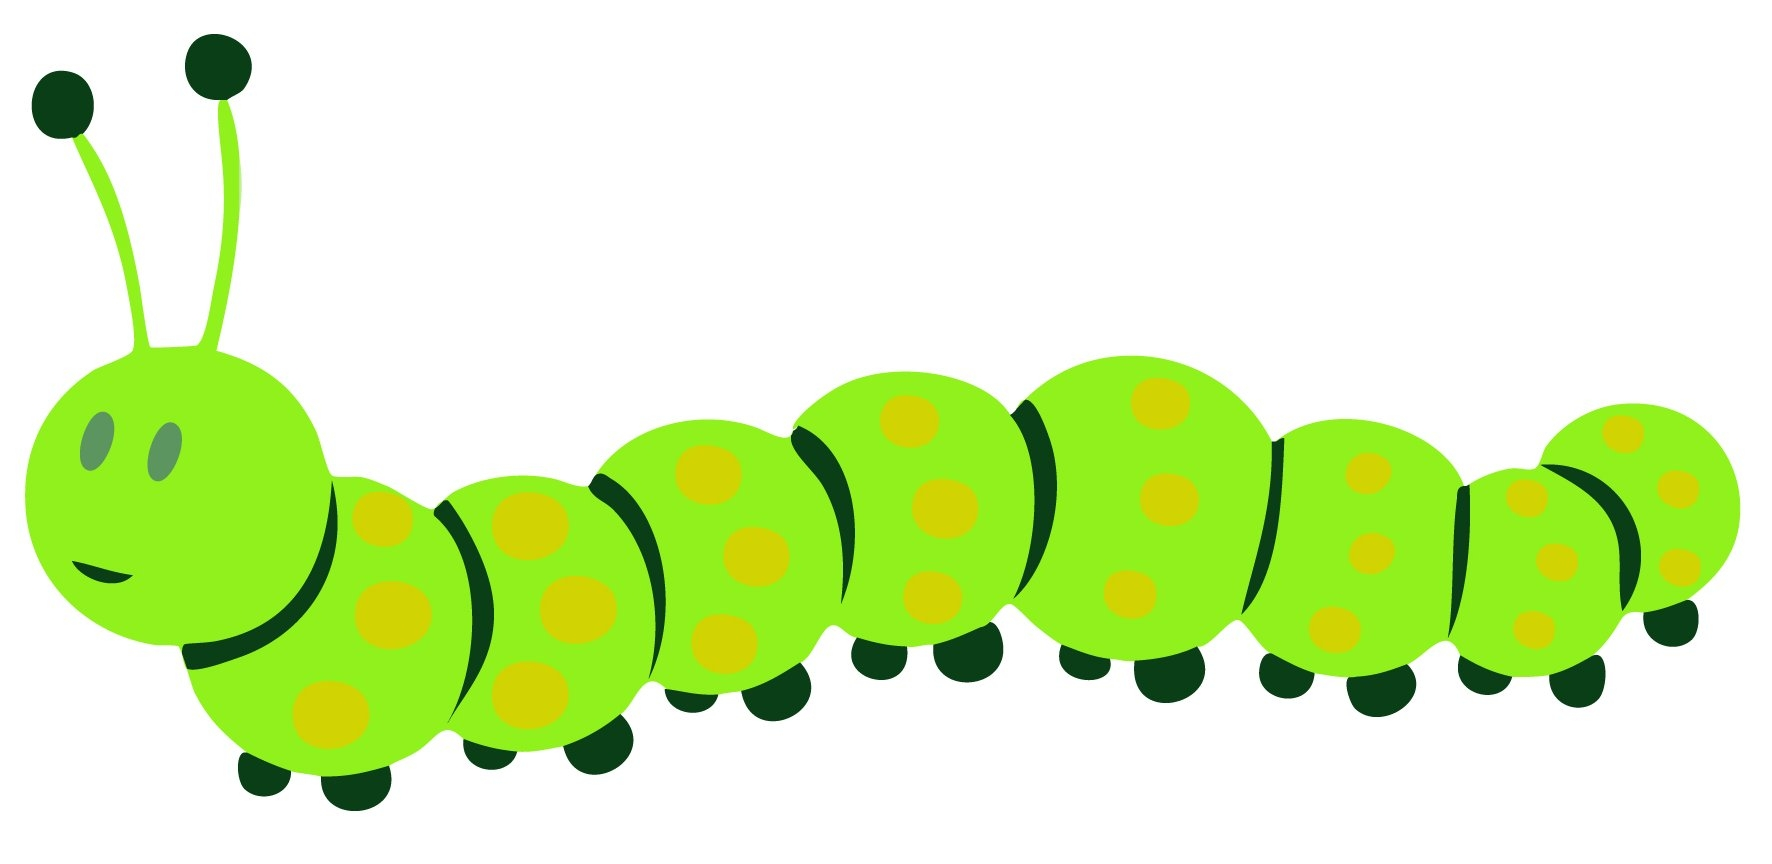 Fresh gallery digital collection. Caterpillar clipart cute